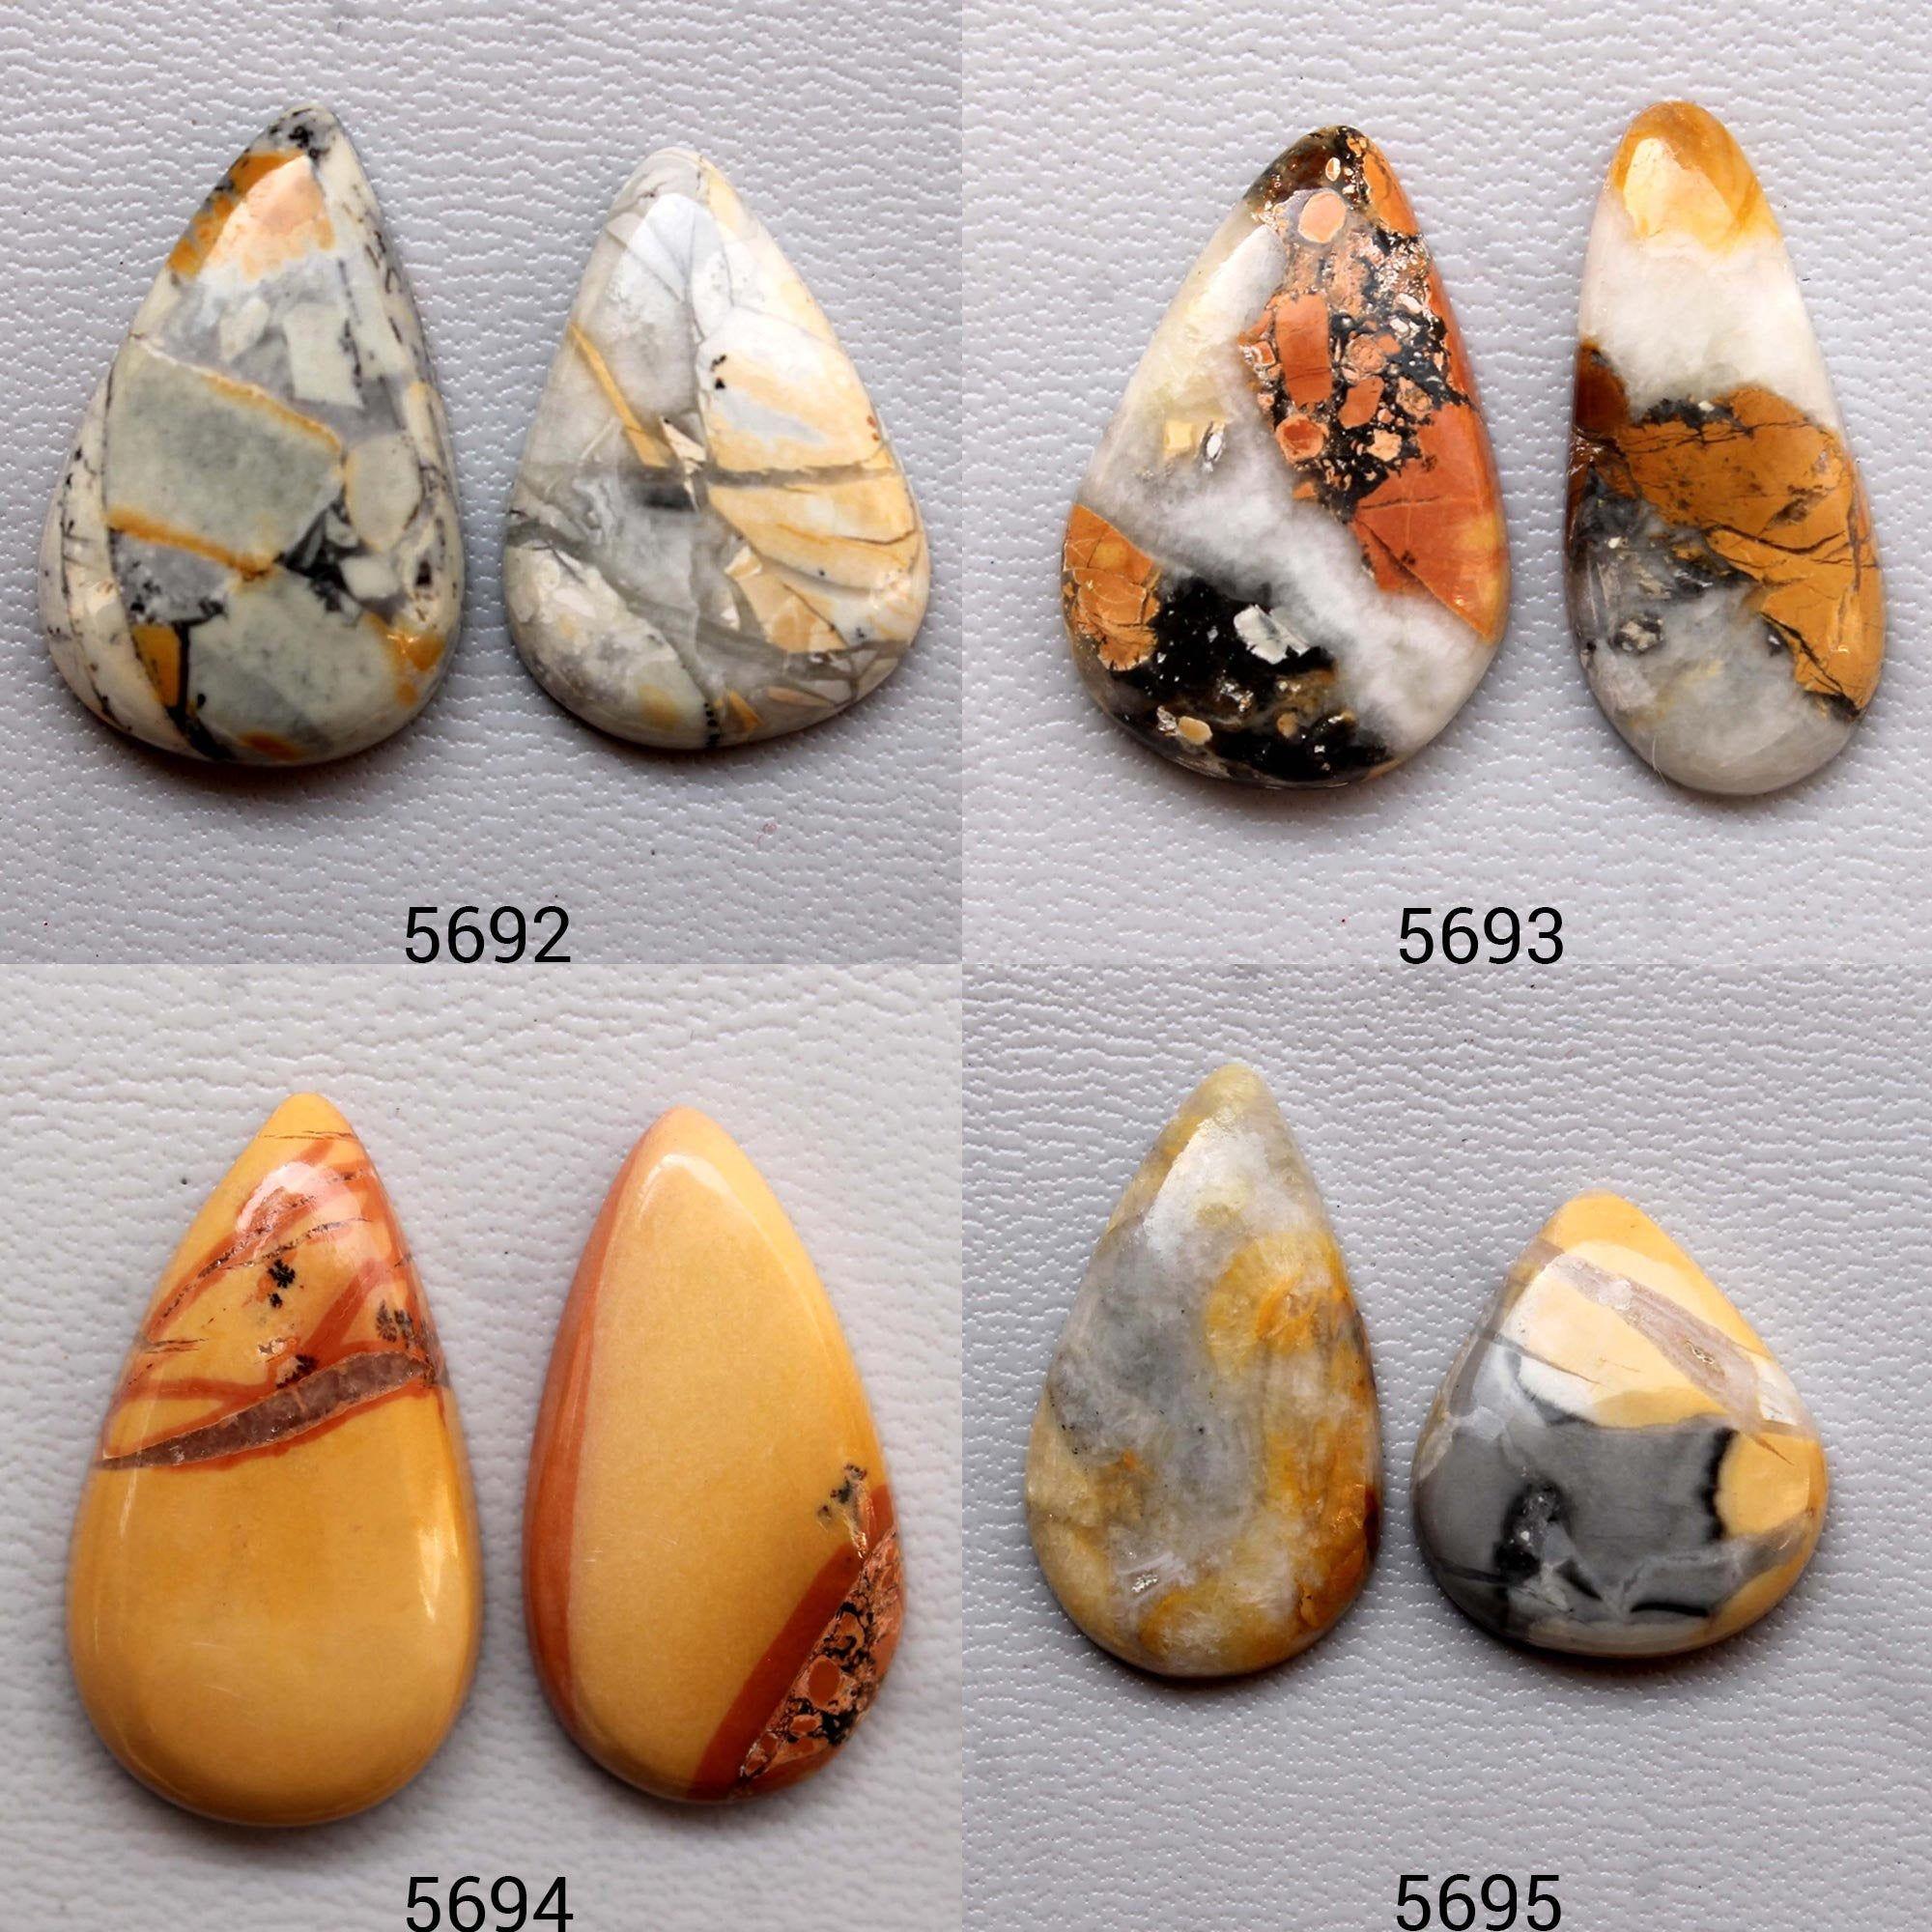 #5417-N Amazing Natural Maligano Jasper cabochon Maligano Jasper stone Semi Precious Maligano Jasper Maligano Jasper loose Gemstone 42 Cts